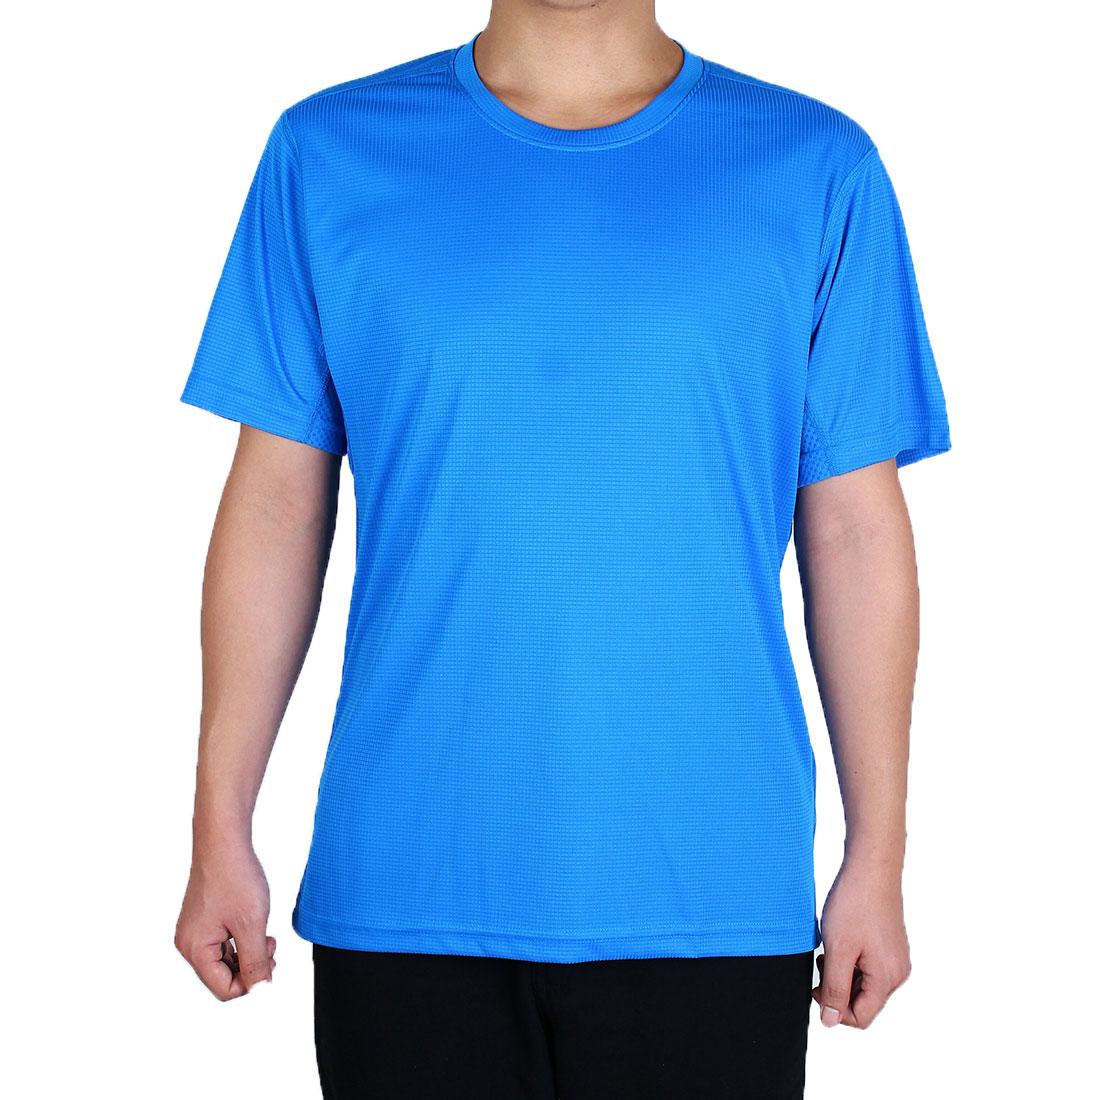 Men Polyester Short Sleeve Clothes Casual Wear Tee Golf Sports T-shirt Blue XL